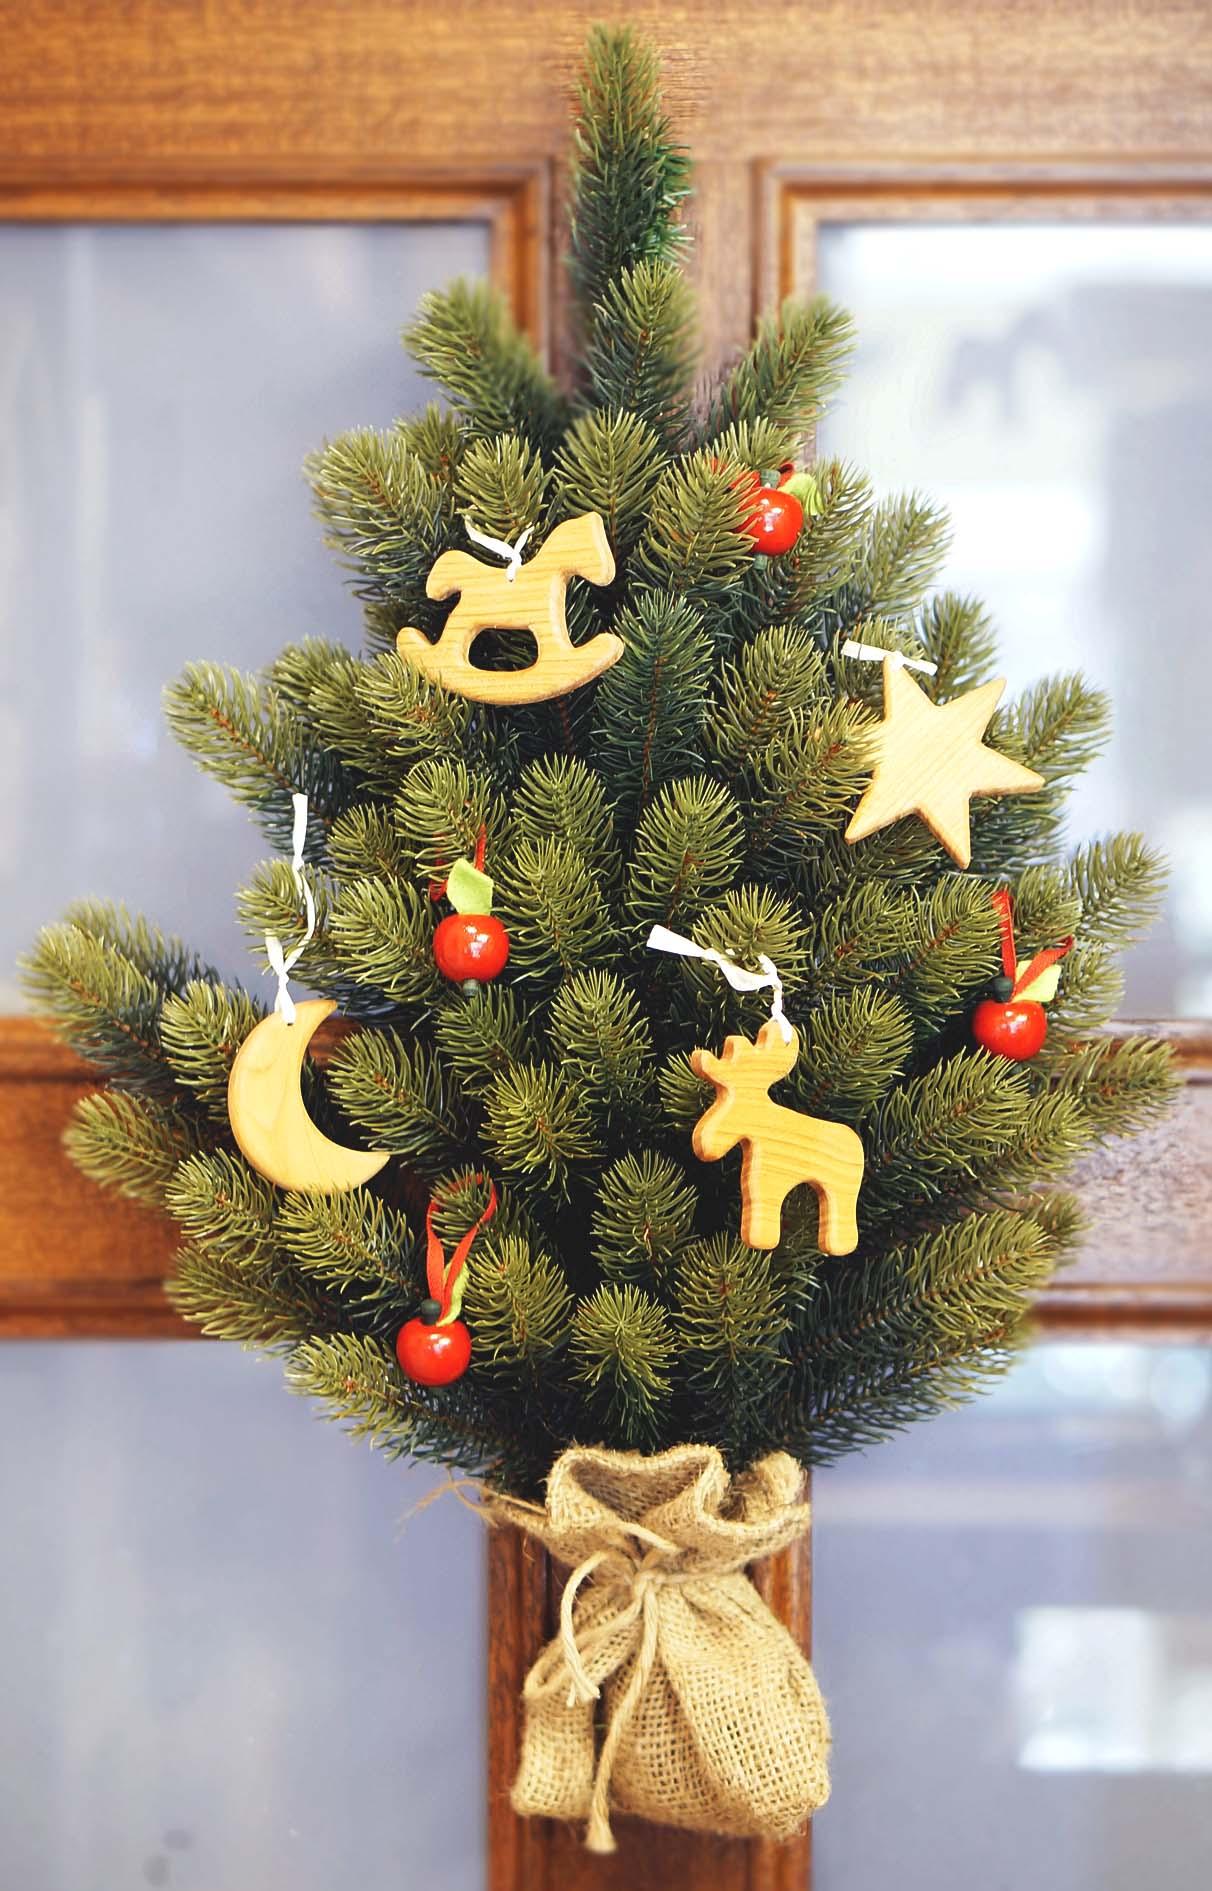 RSグローバルトレード社のクリスマスツリー 壁掛け式ツリー